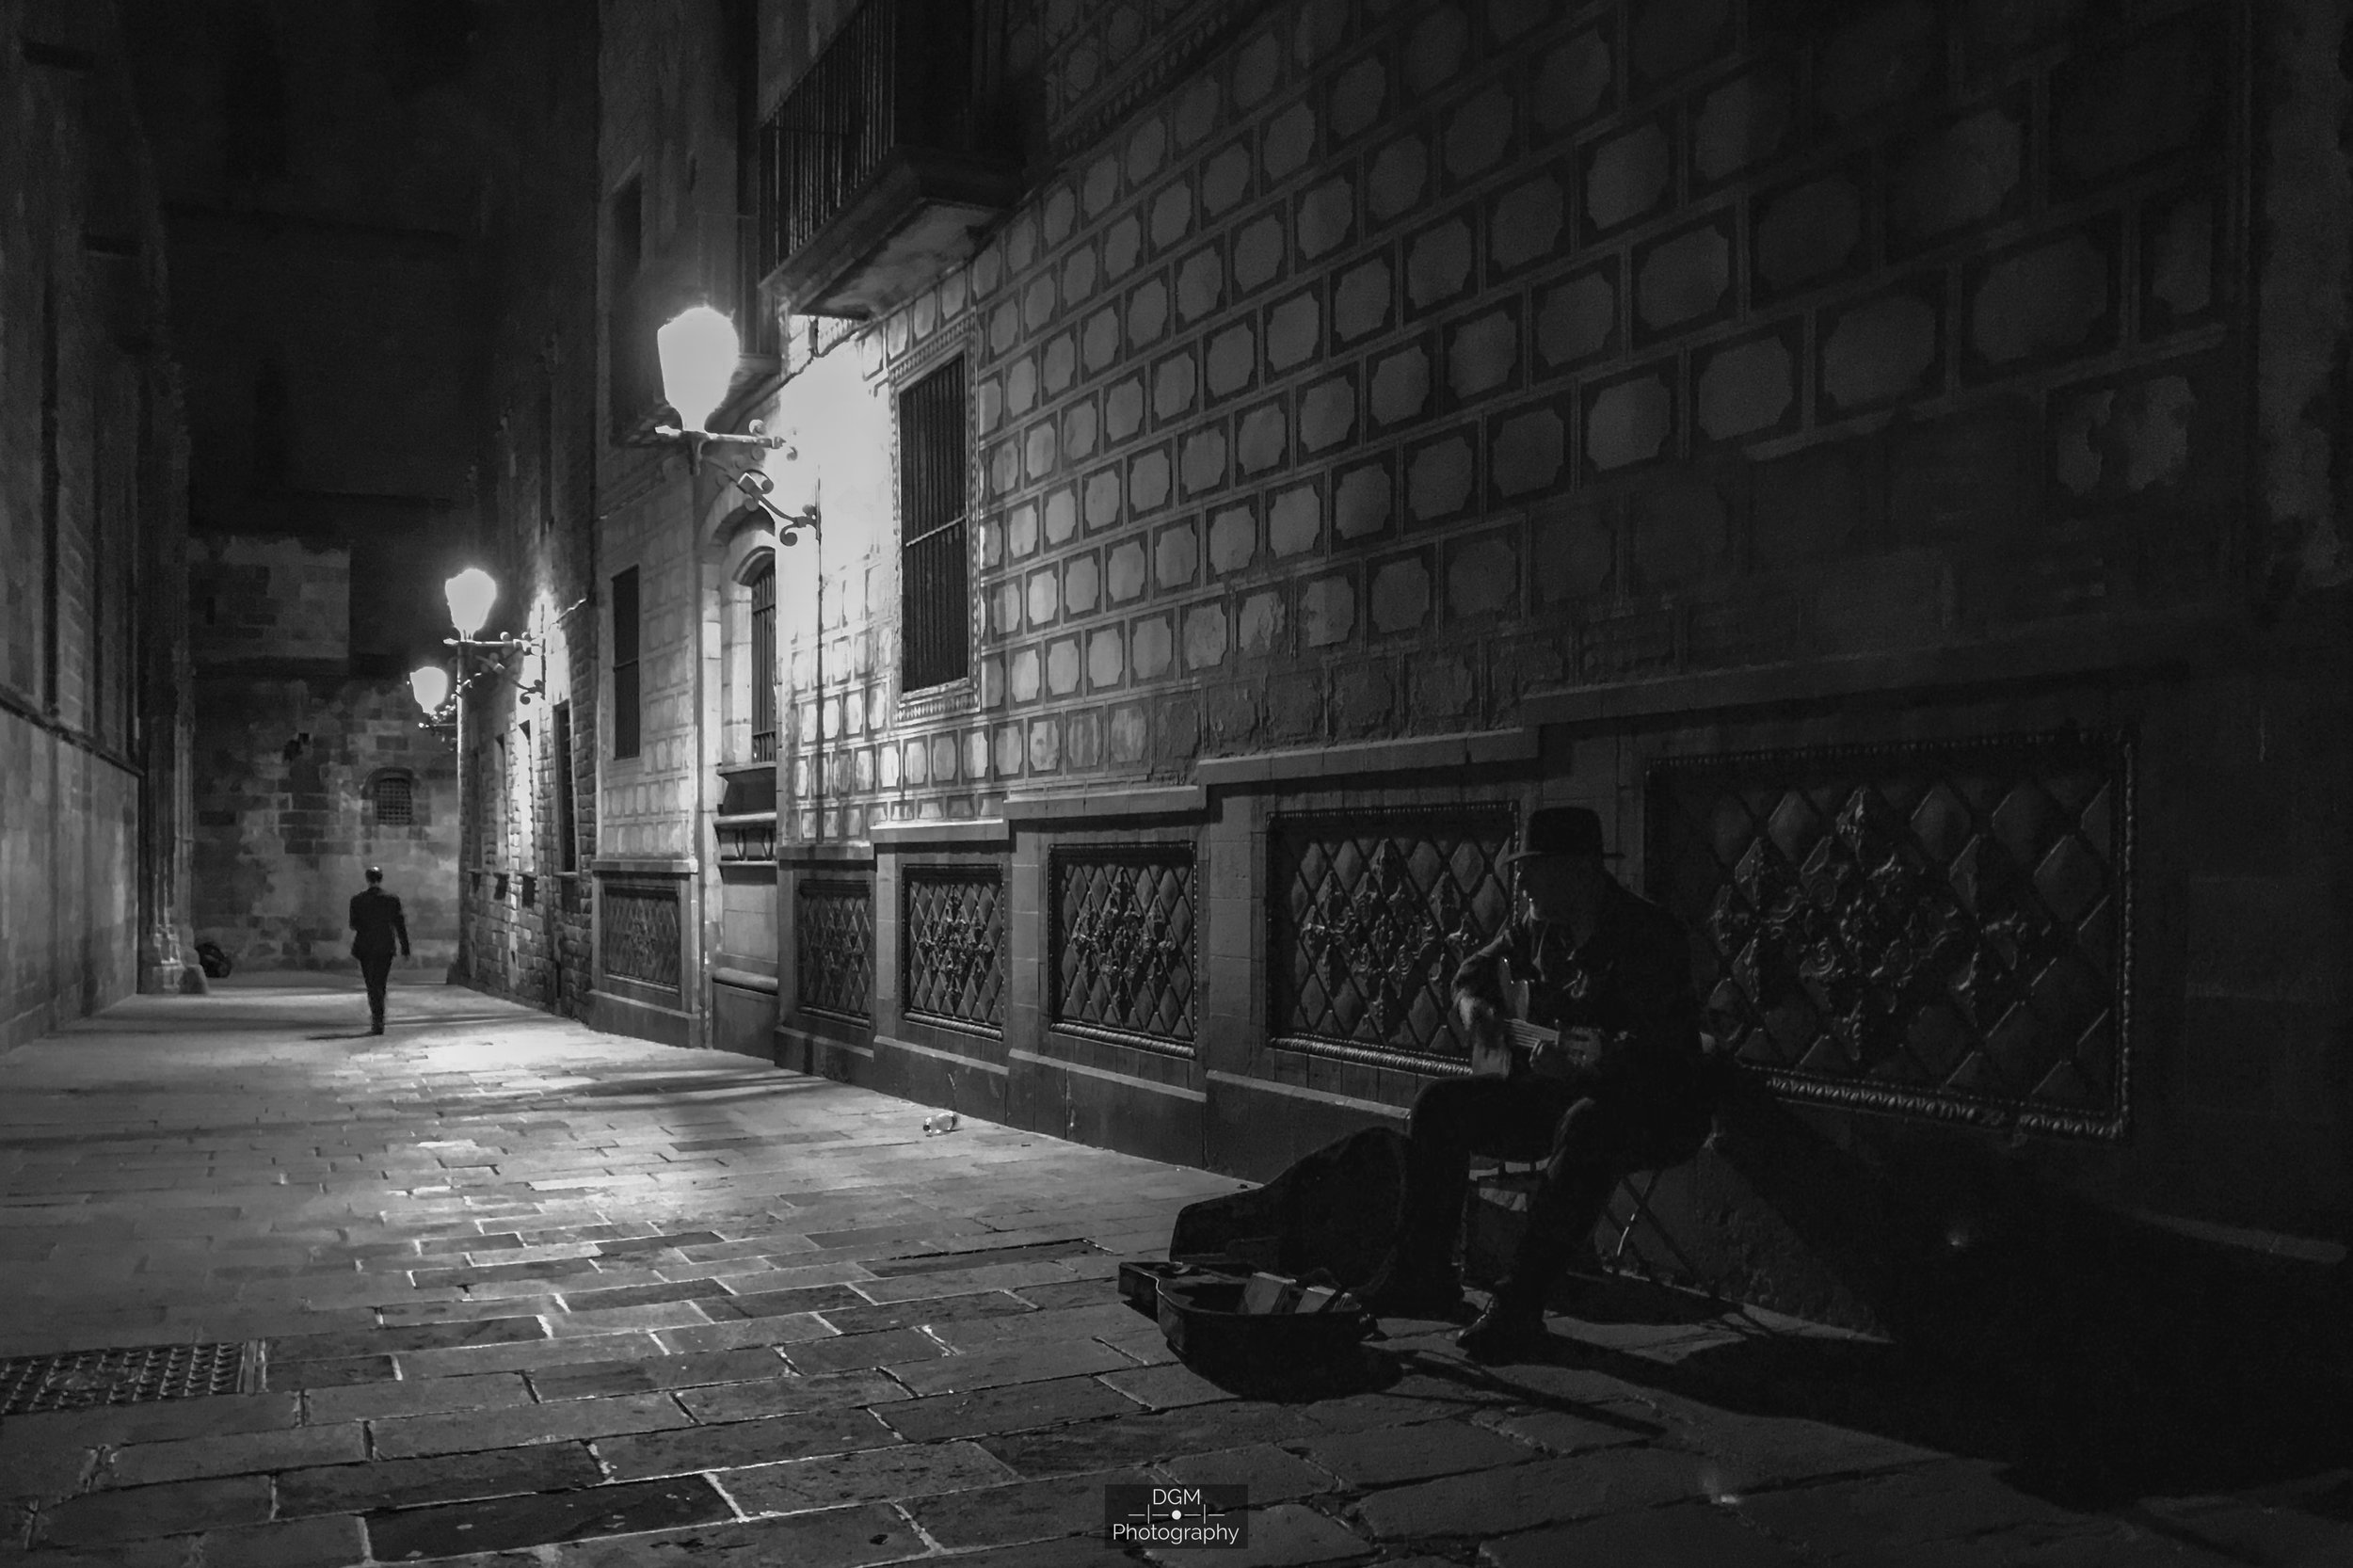 Barcelona | España  Sep. 23, 2018  —  ⭐️   Night Street Photography     Challenge -  Flávio Souza Cruz   ⭐️   A Film Noir Story   Challenge -  Flávio Souza Cruz